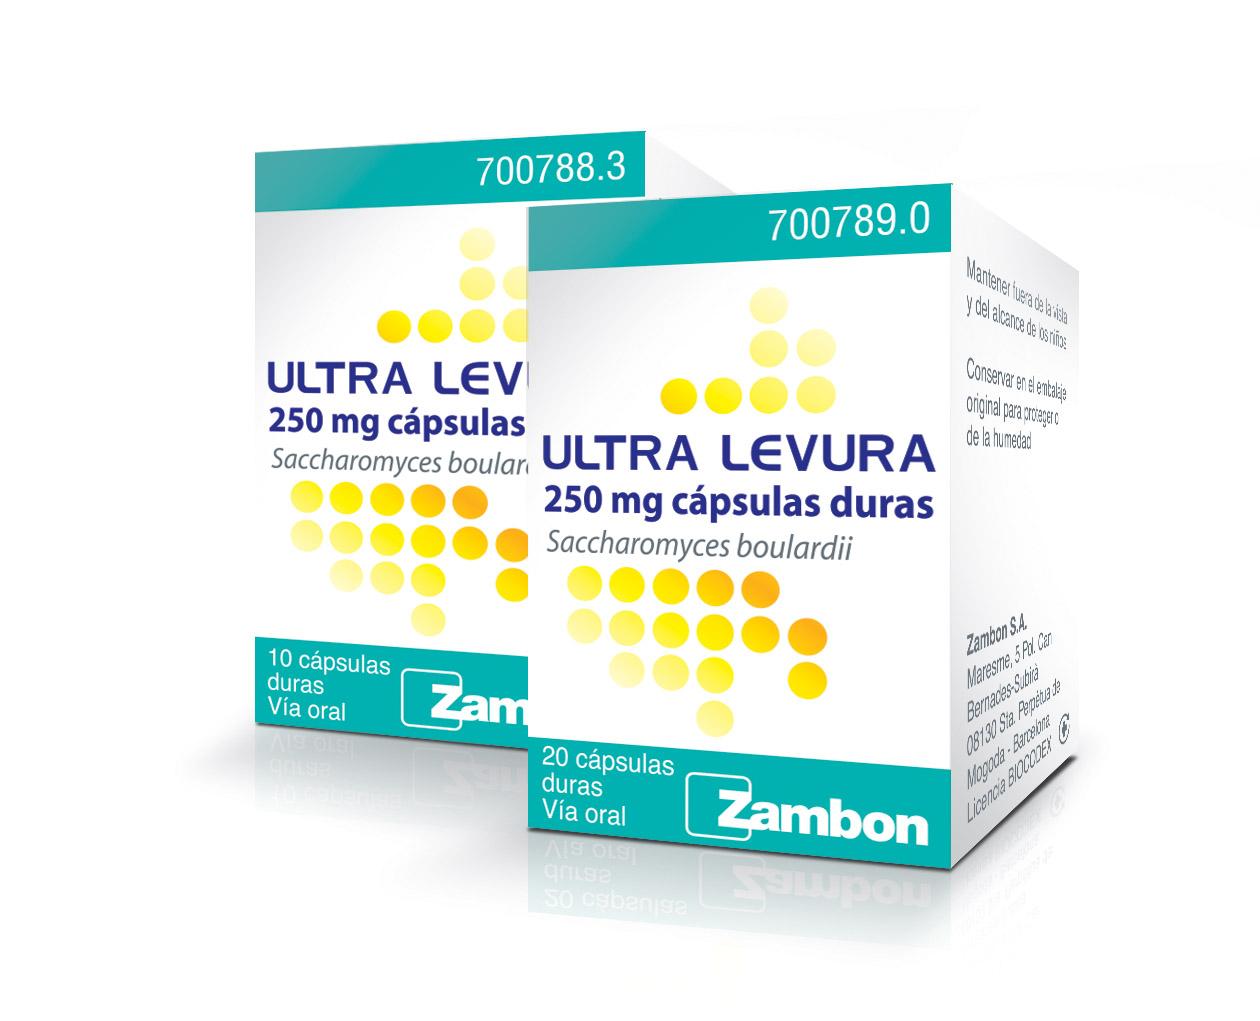 UltraLevura-250-mg-capsulas